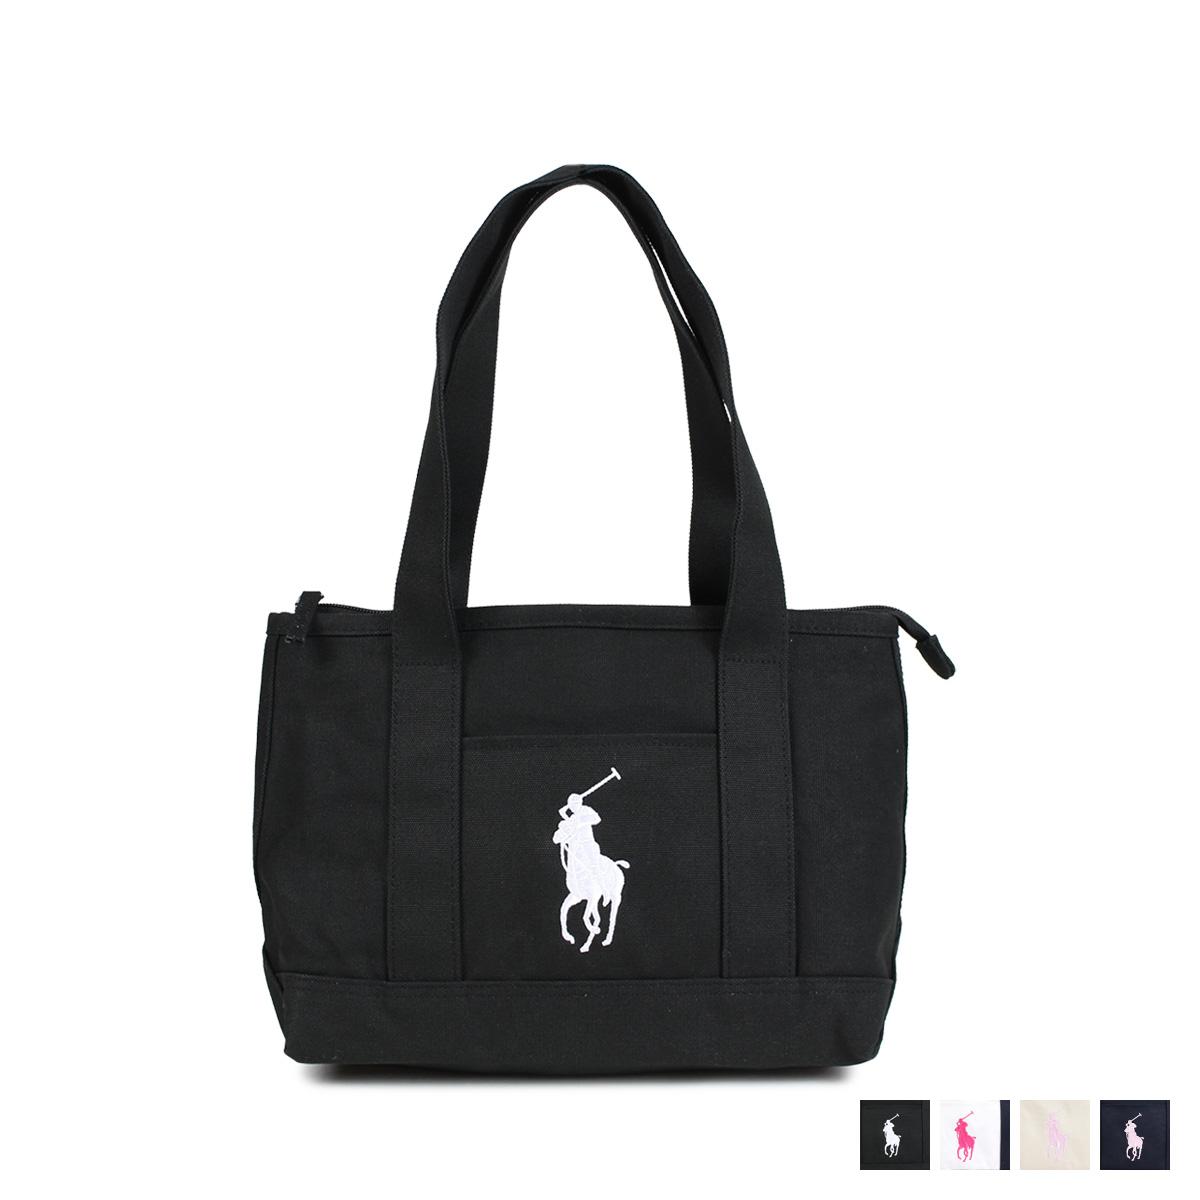 b7d456f9890 POLO RALPH LAUREN MEDIUM TOTE polo Ralph Lauren bag tote bag men gap Dis  canvas black ...